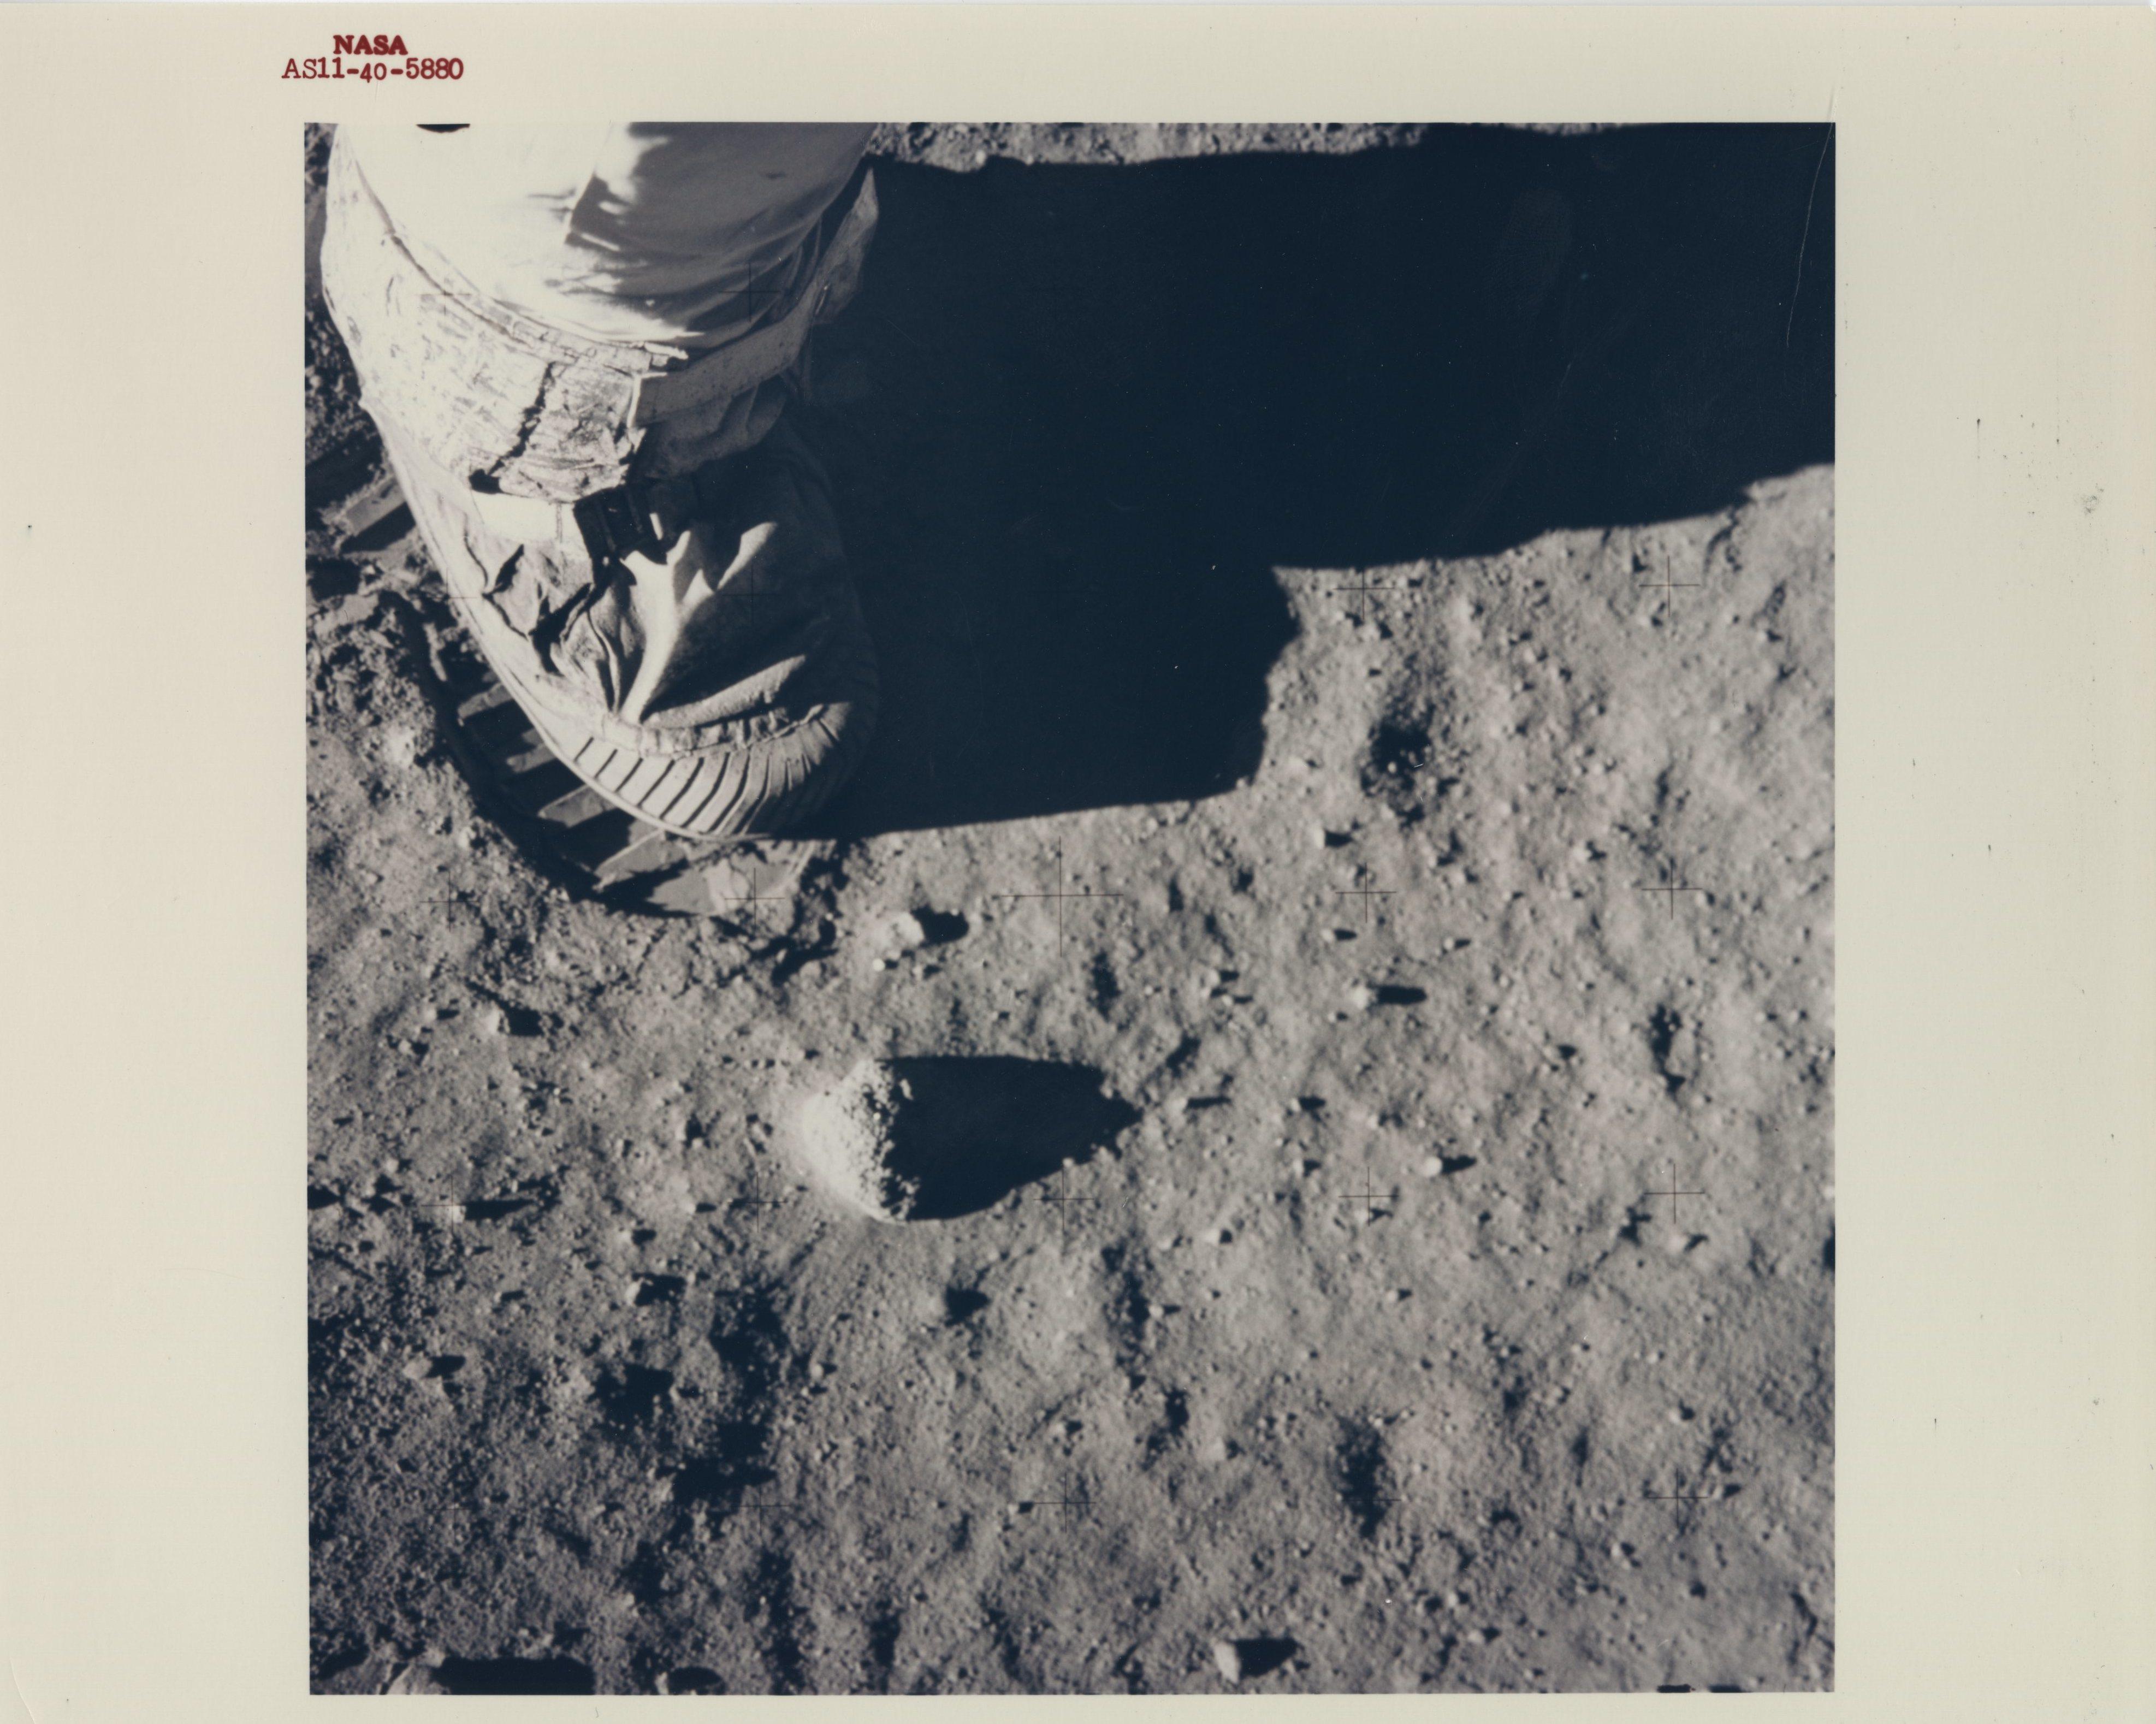 lunarlandingphoto001